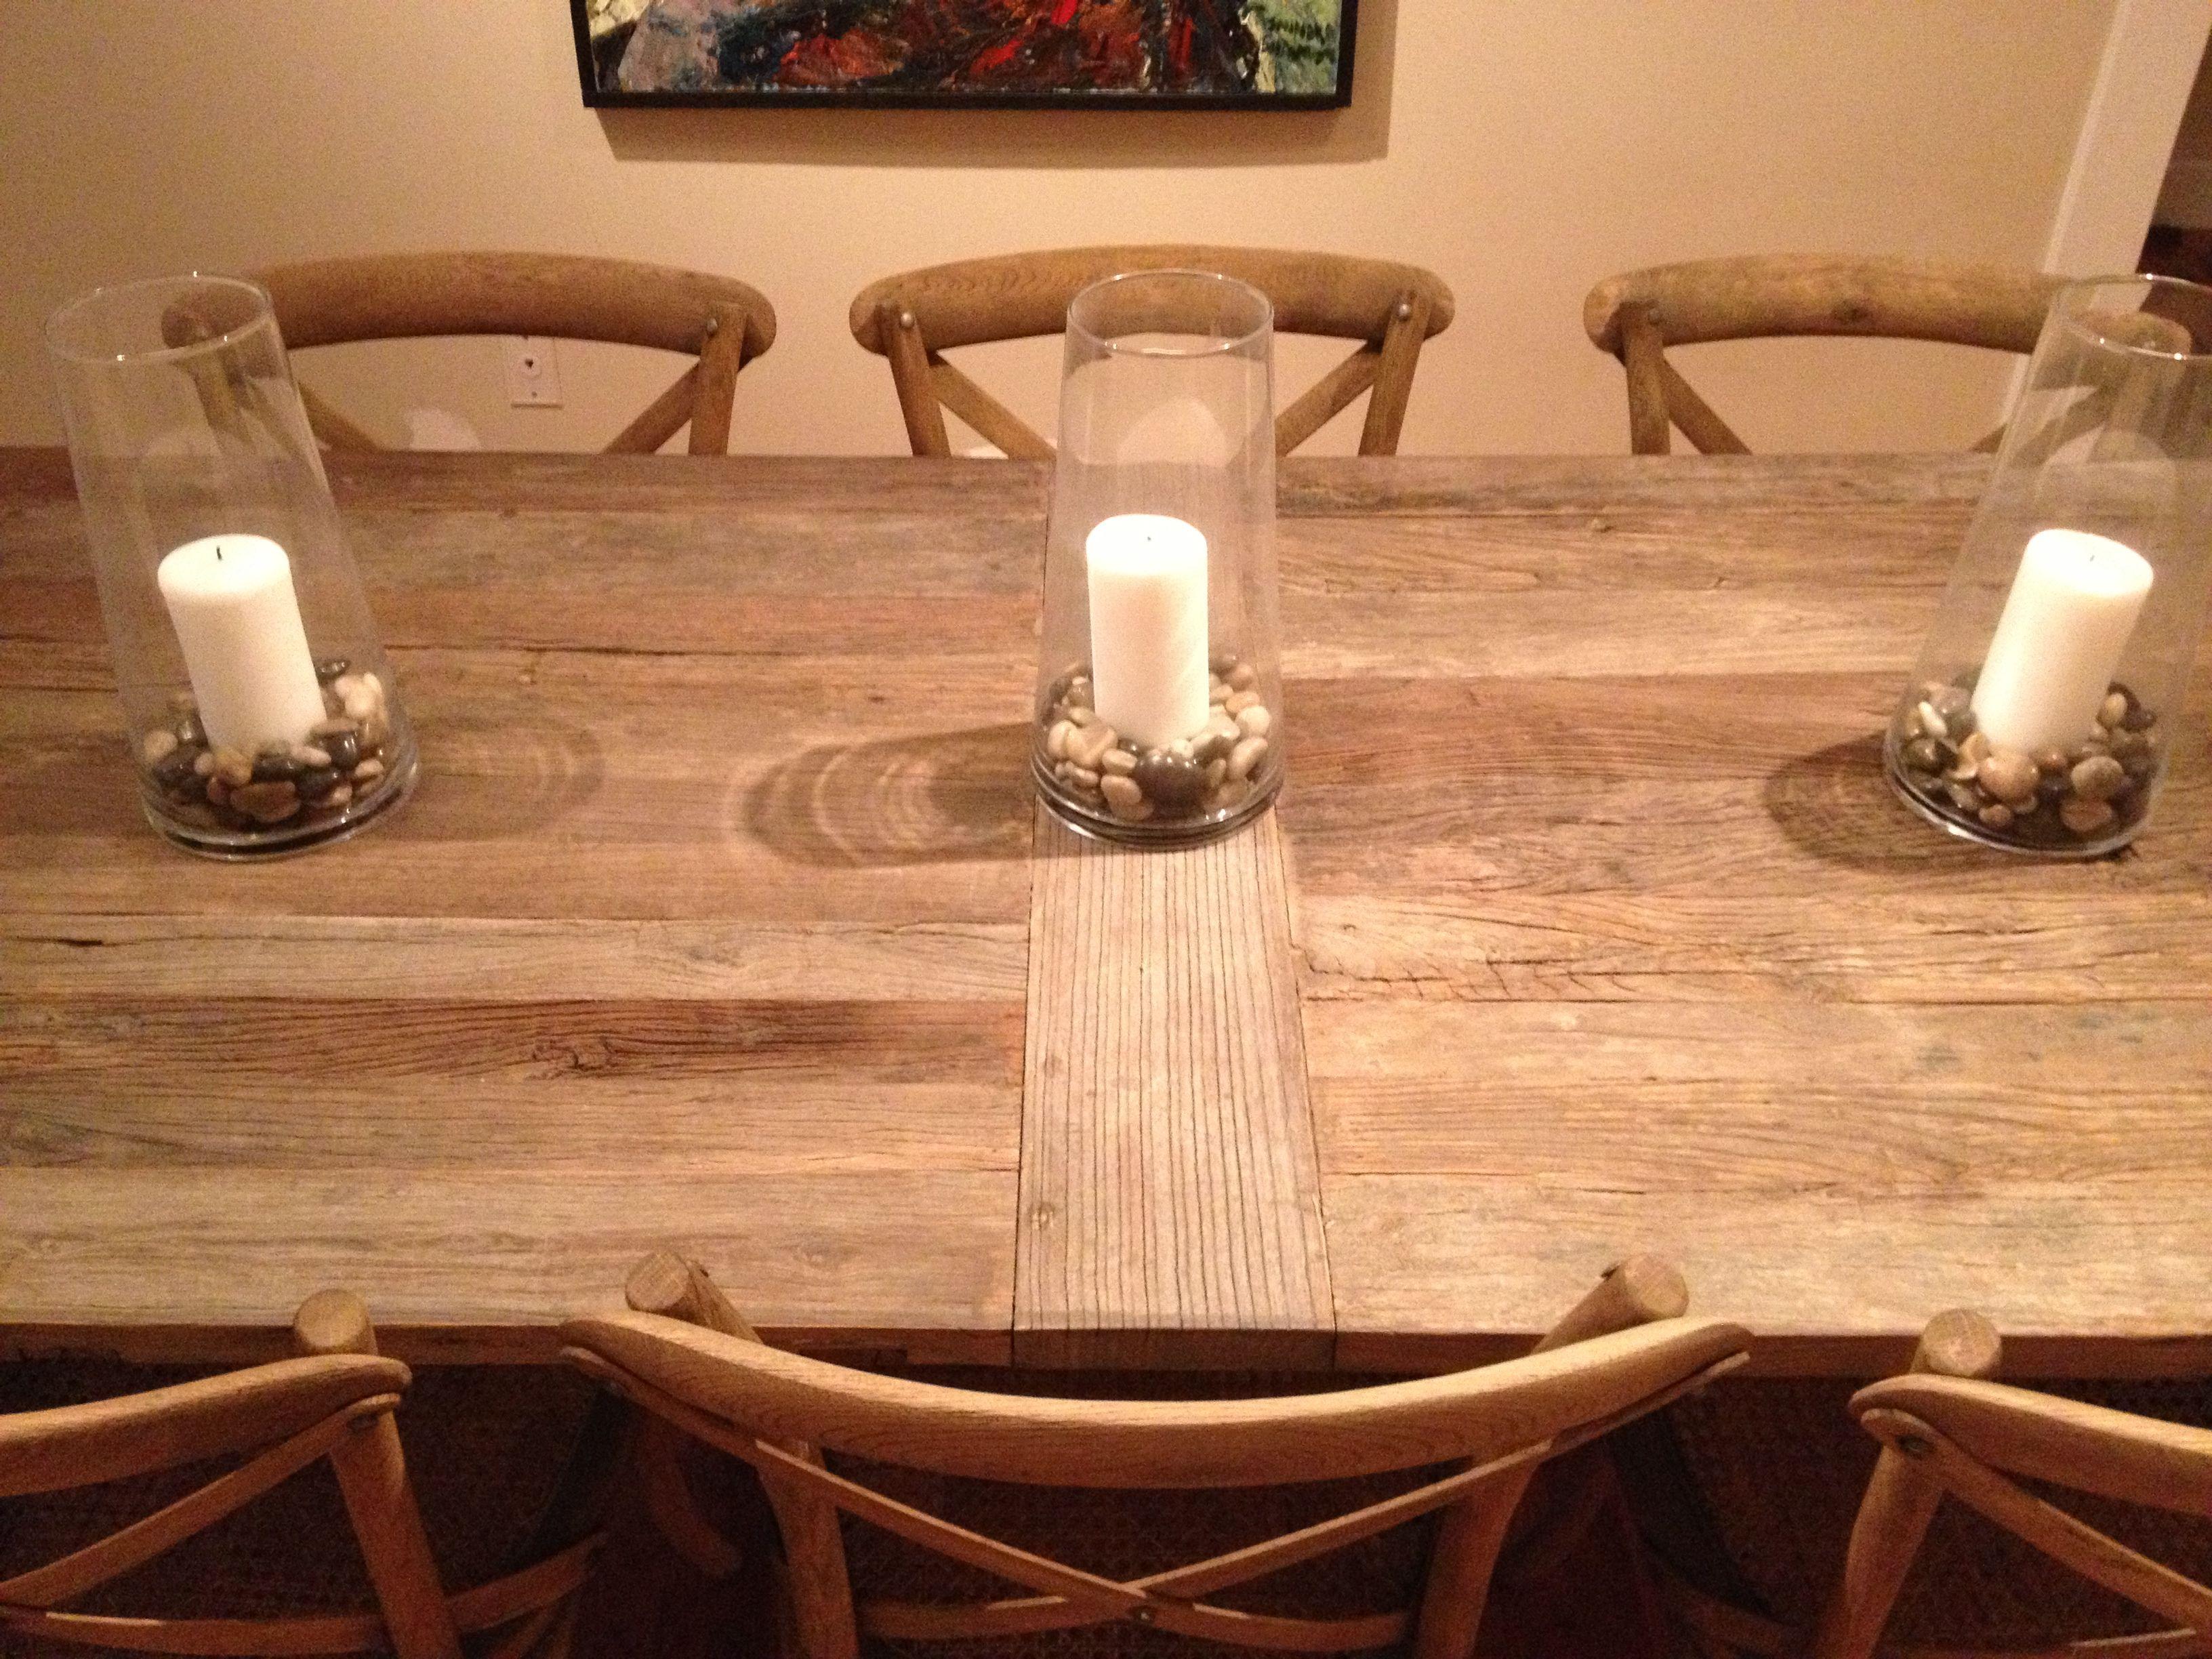 restoration hardware kitchen table travertine tile for backsplash in flatiron dining with madeleine side chairs from